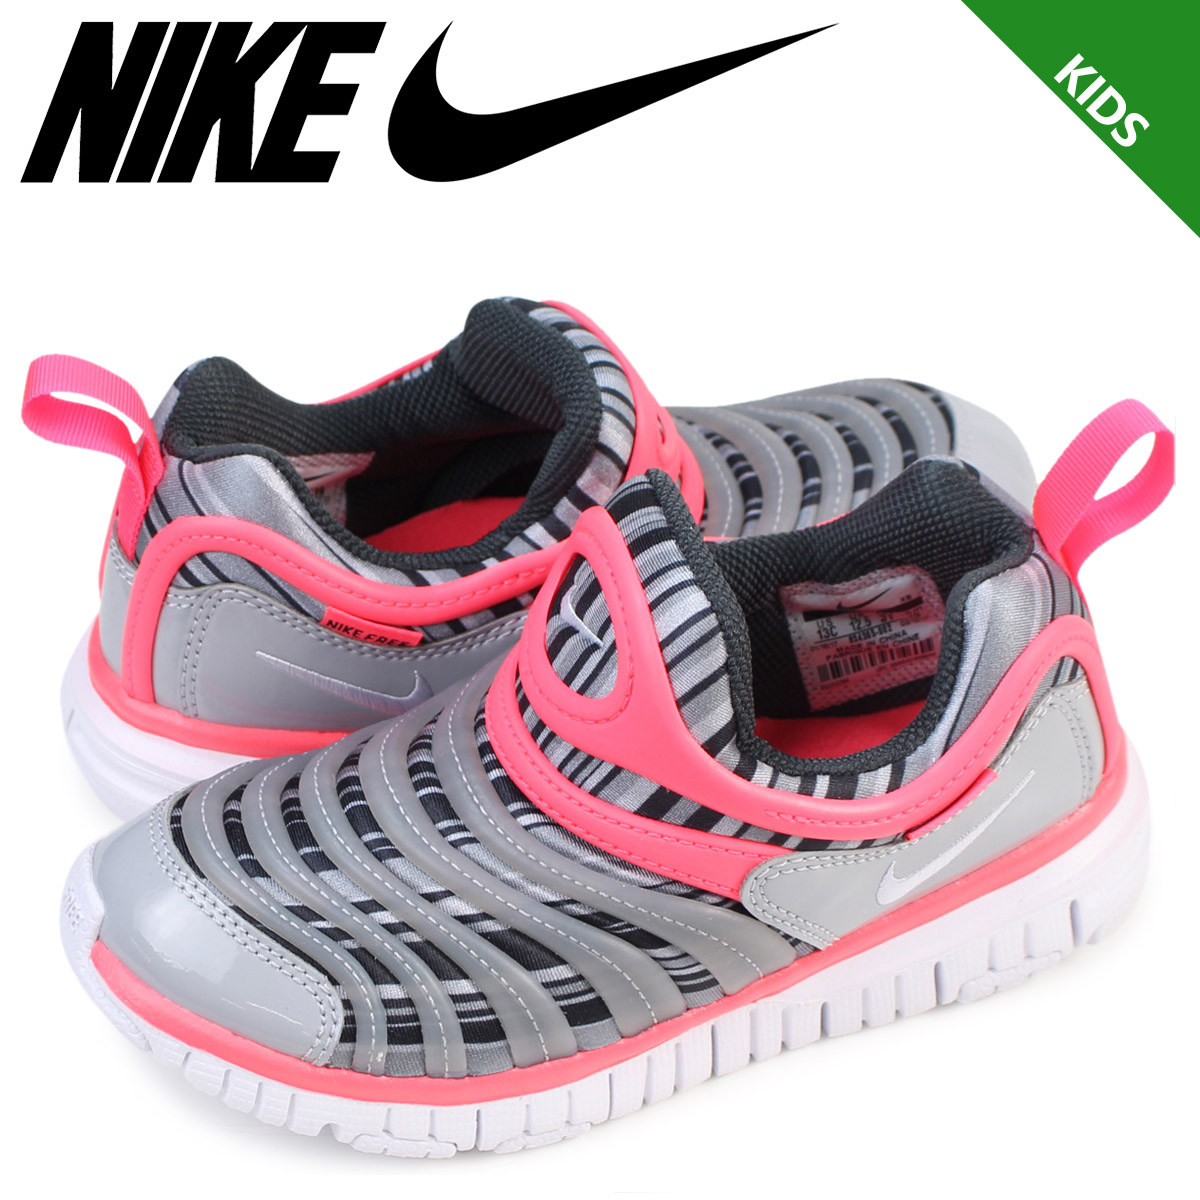 Nike Jr Gratuitement